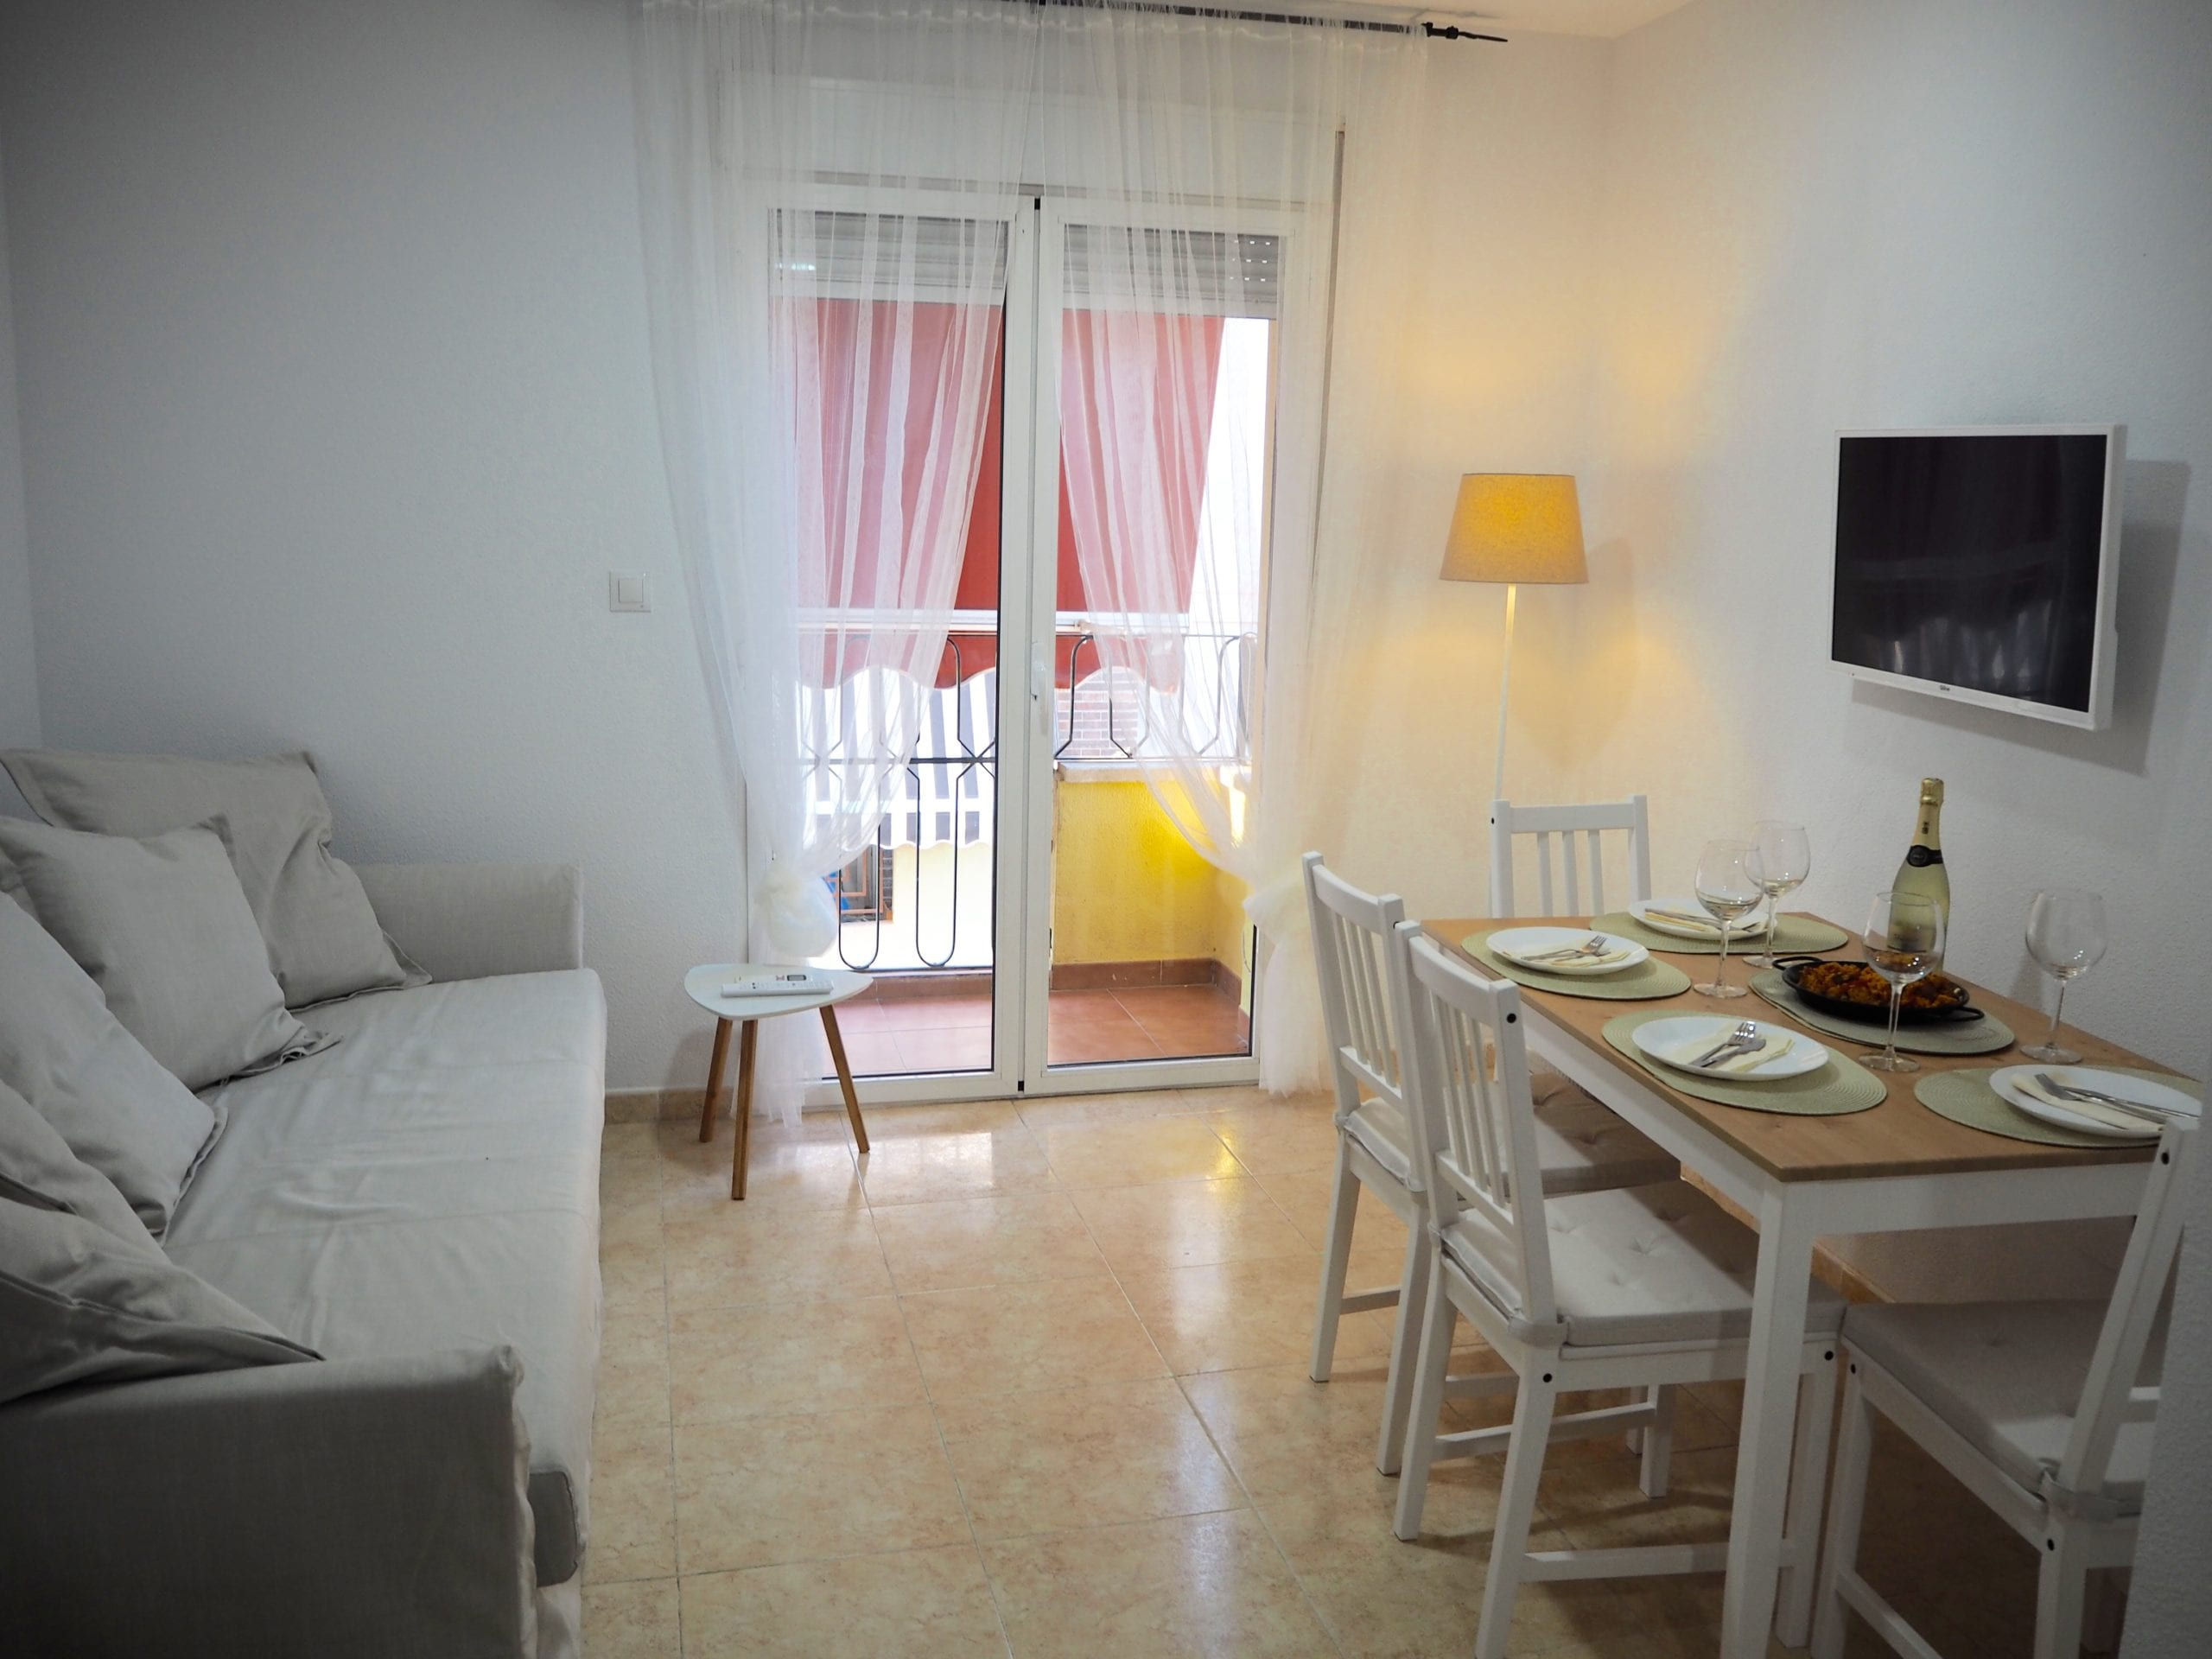 Amiga / Apartament do wynajęcia w Alicante